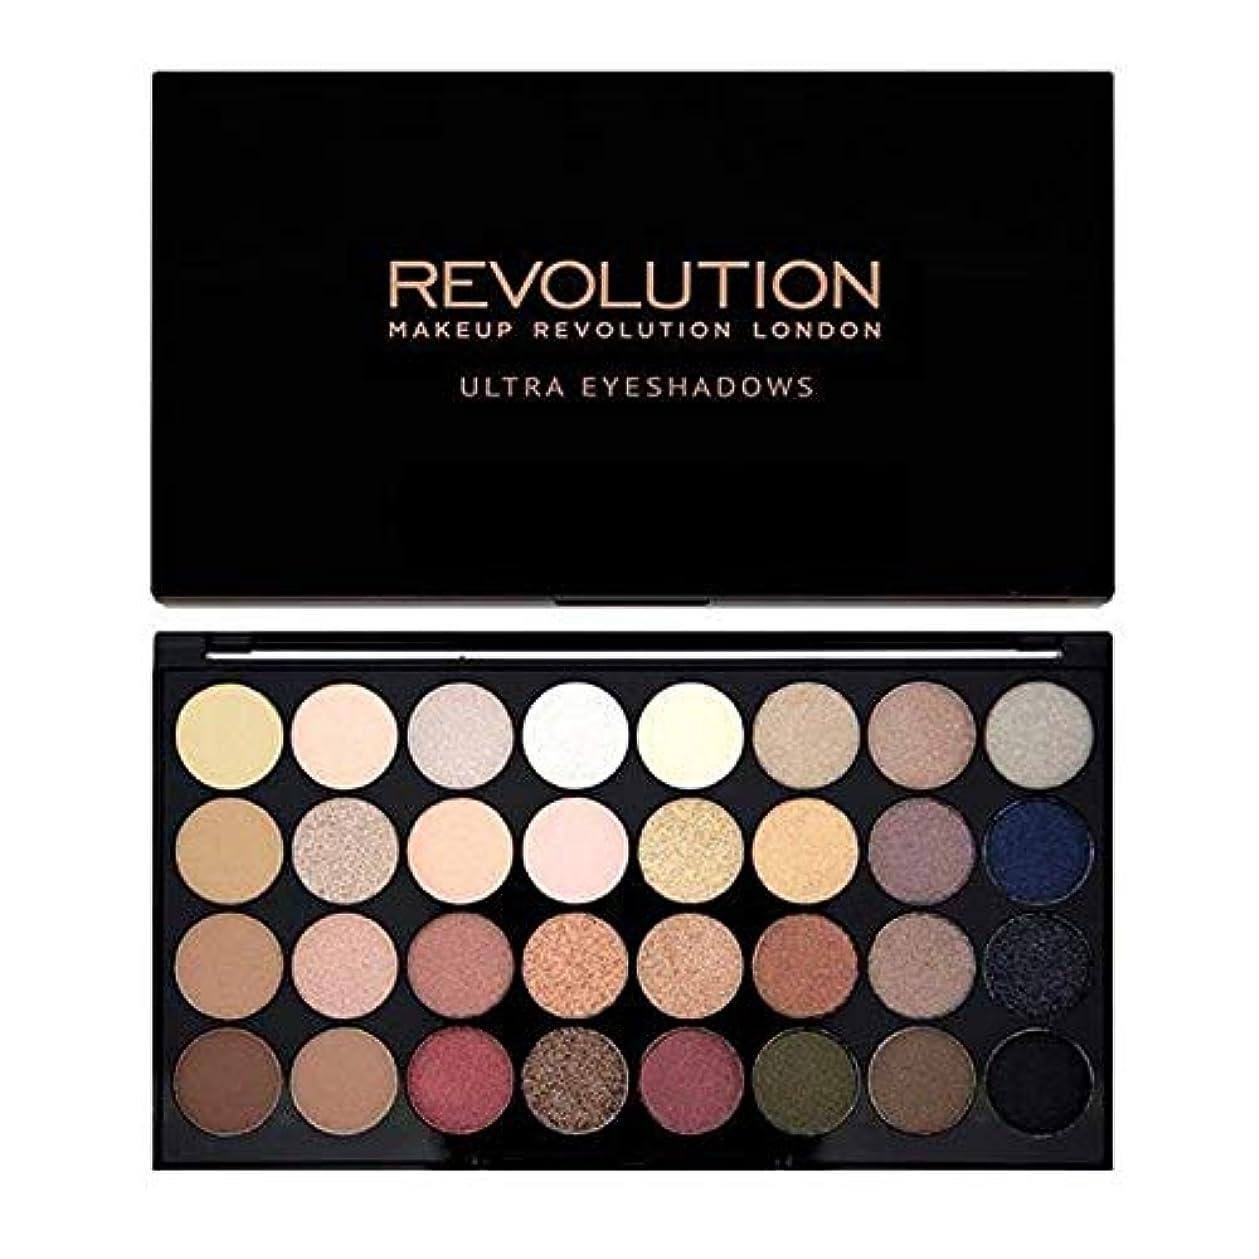 [Revolution ] 革命完璧な16グラムアイシャドウパレット - Revolution Flawless 16G Eye Shadow Palette [並行輸入品]